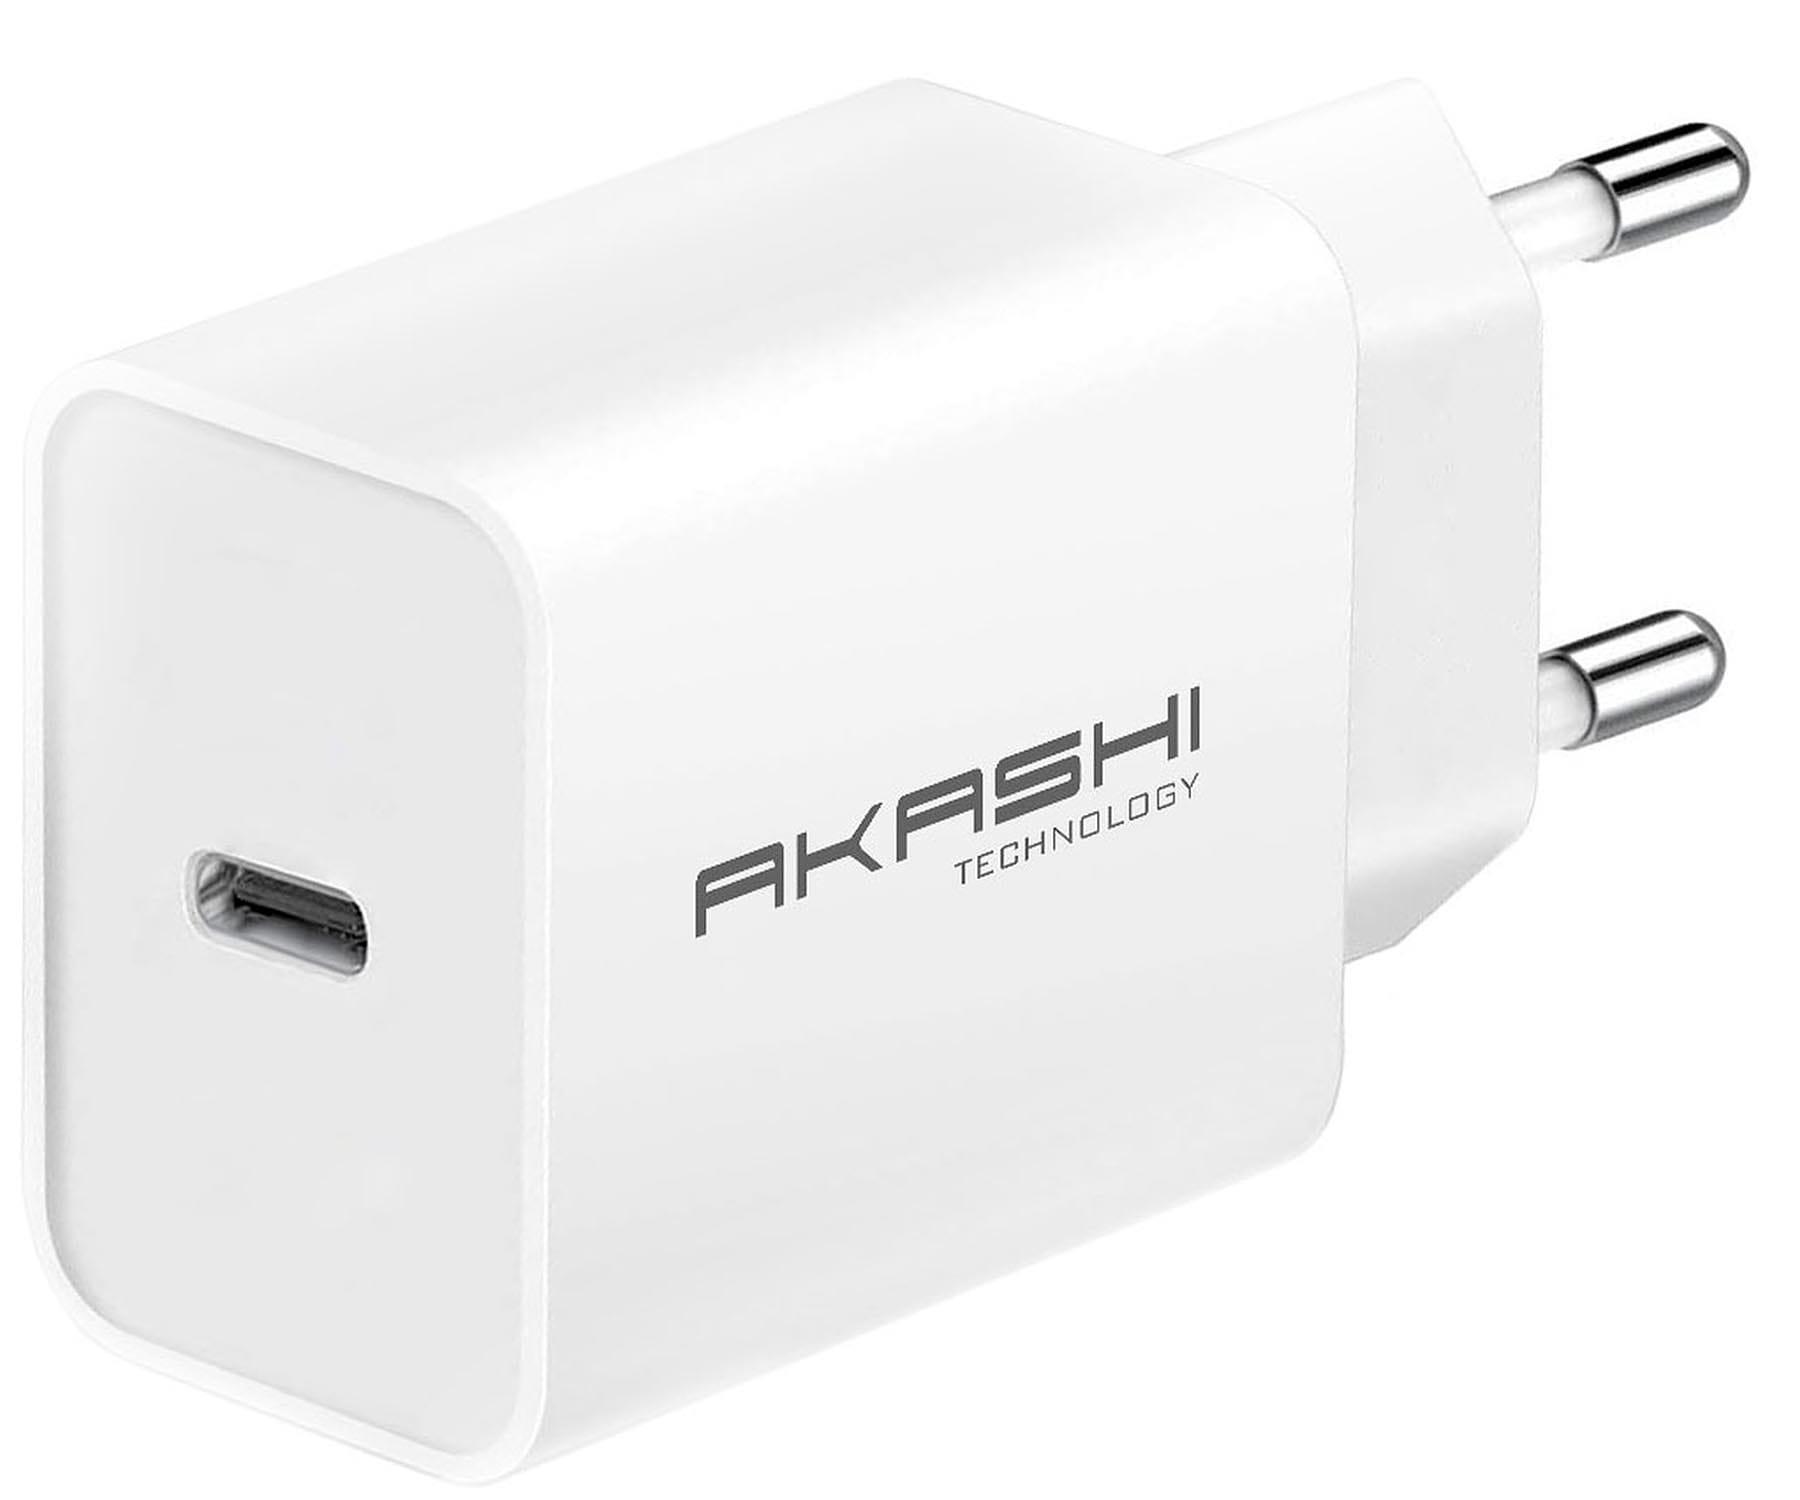 AKASHI ALTACPD18WH CARGADOR BLANCO PARED 3A USB-C 18W CARGA RÁPIDA